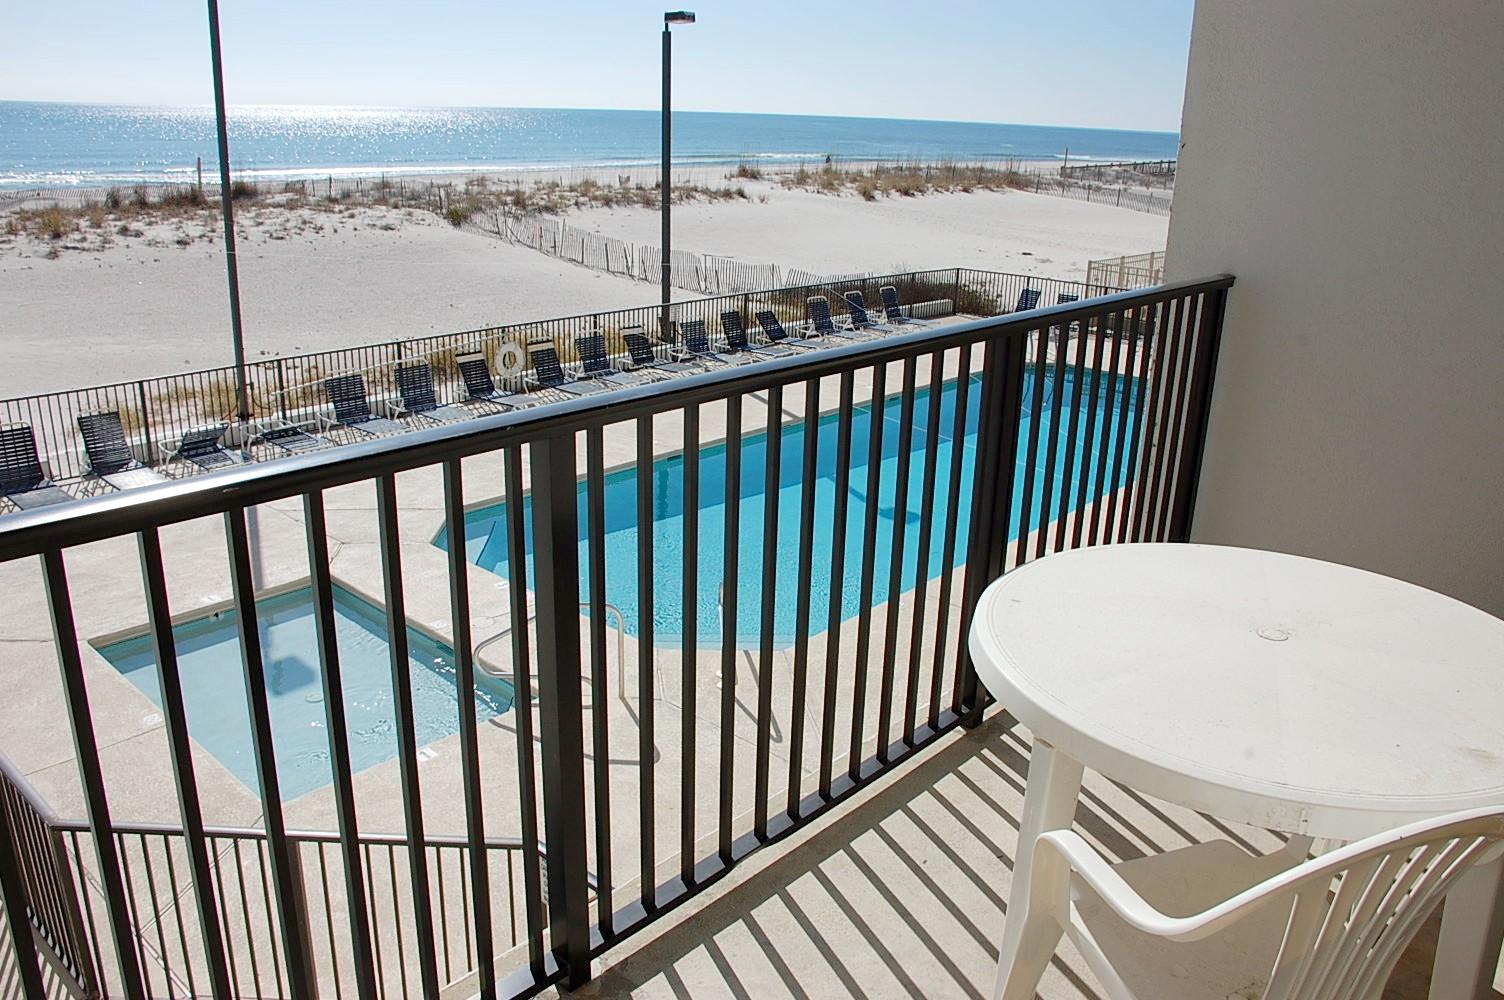 Island Winds West 177 Condo rental in Island Winds West in Gulf Shores Alabama - #5